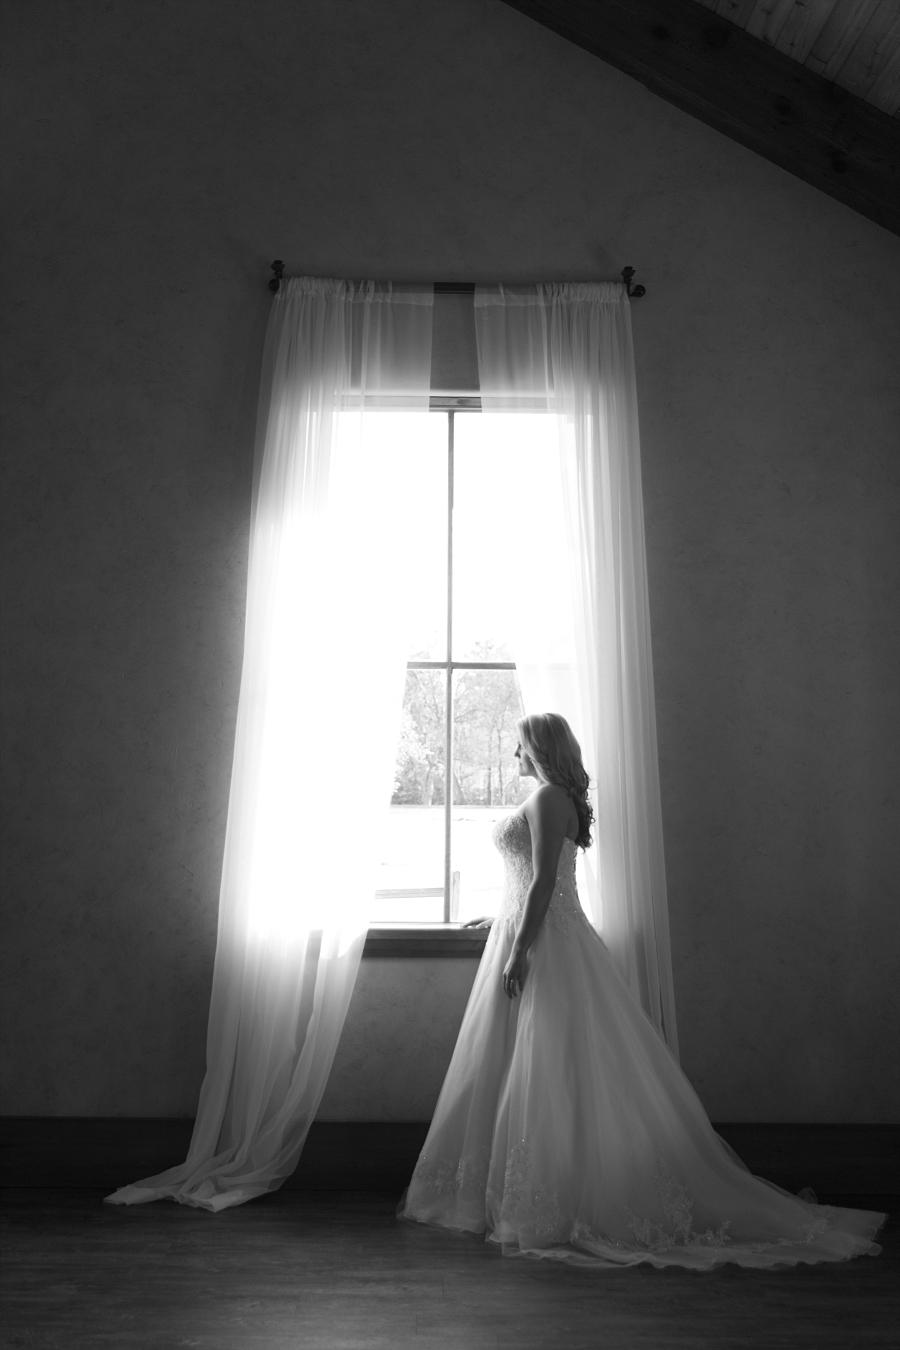 Stacy-Anderson-Photography-Balmorhea-Tomball-Wedding-Photographer_0002.jpg